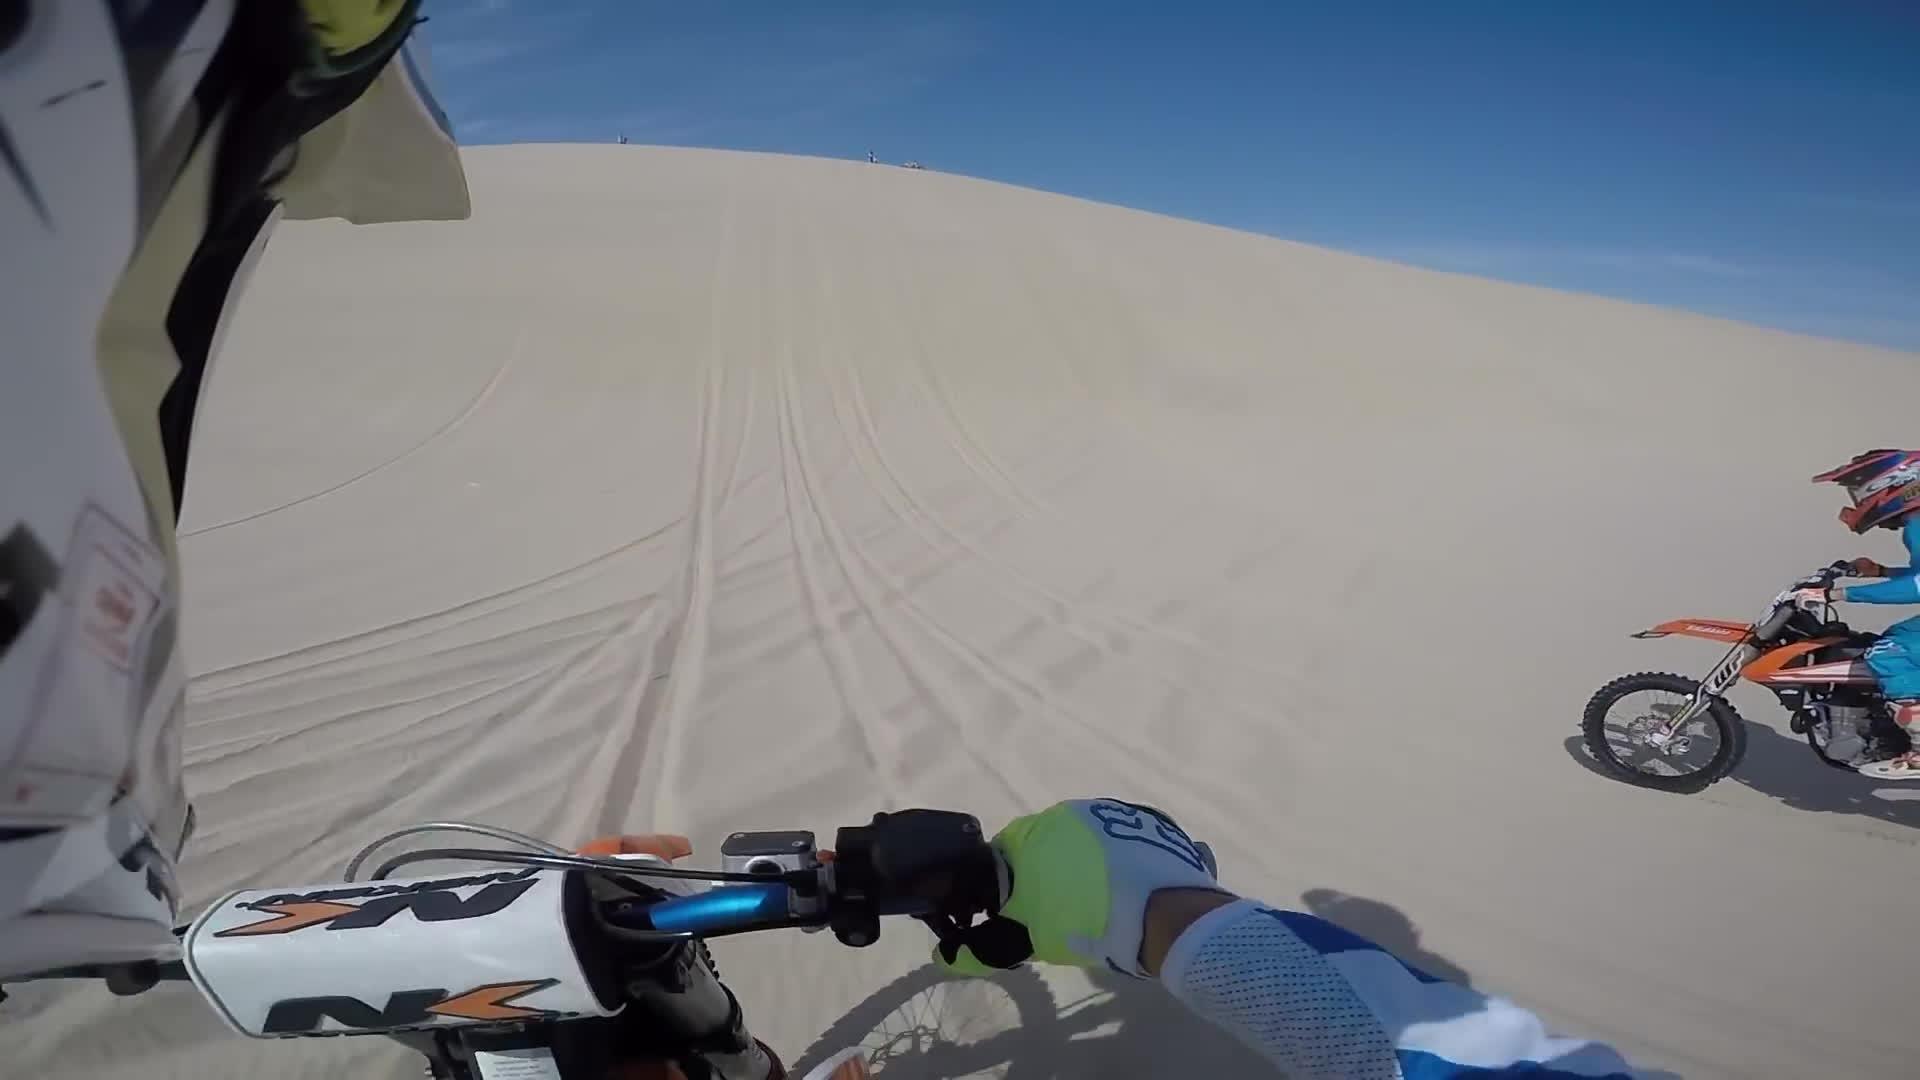 dashcamgifs, 100ft Dirt bike dune jump landed onto Jeep wrangler hood GIFs